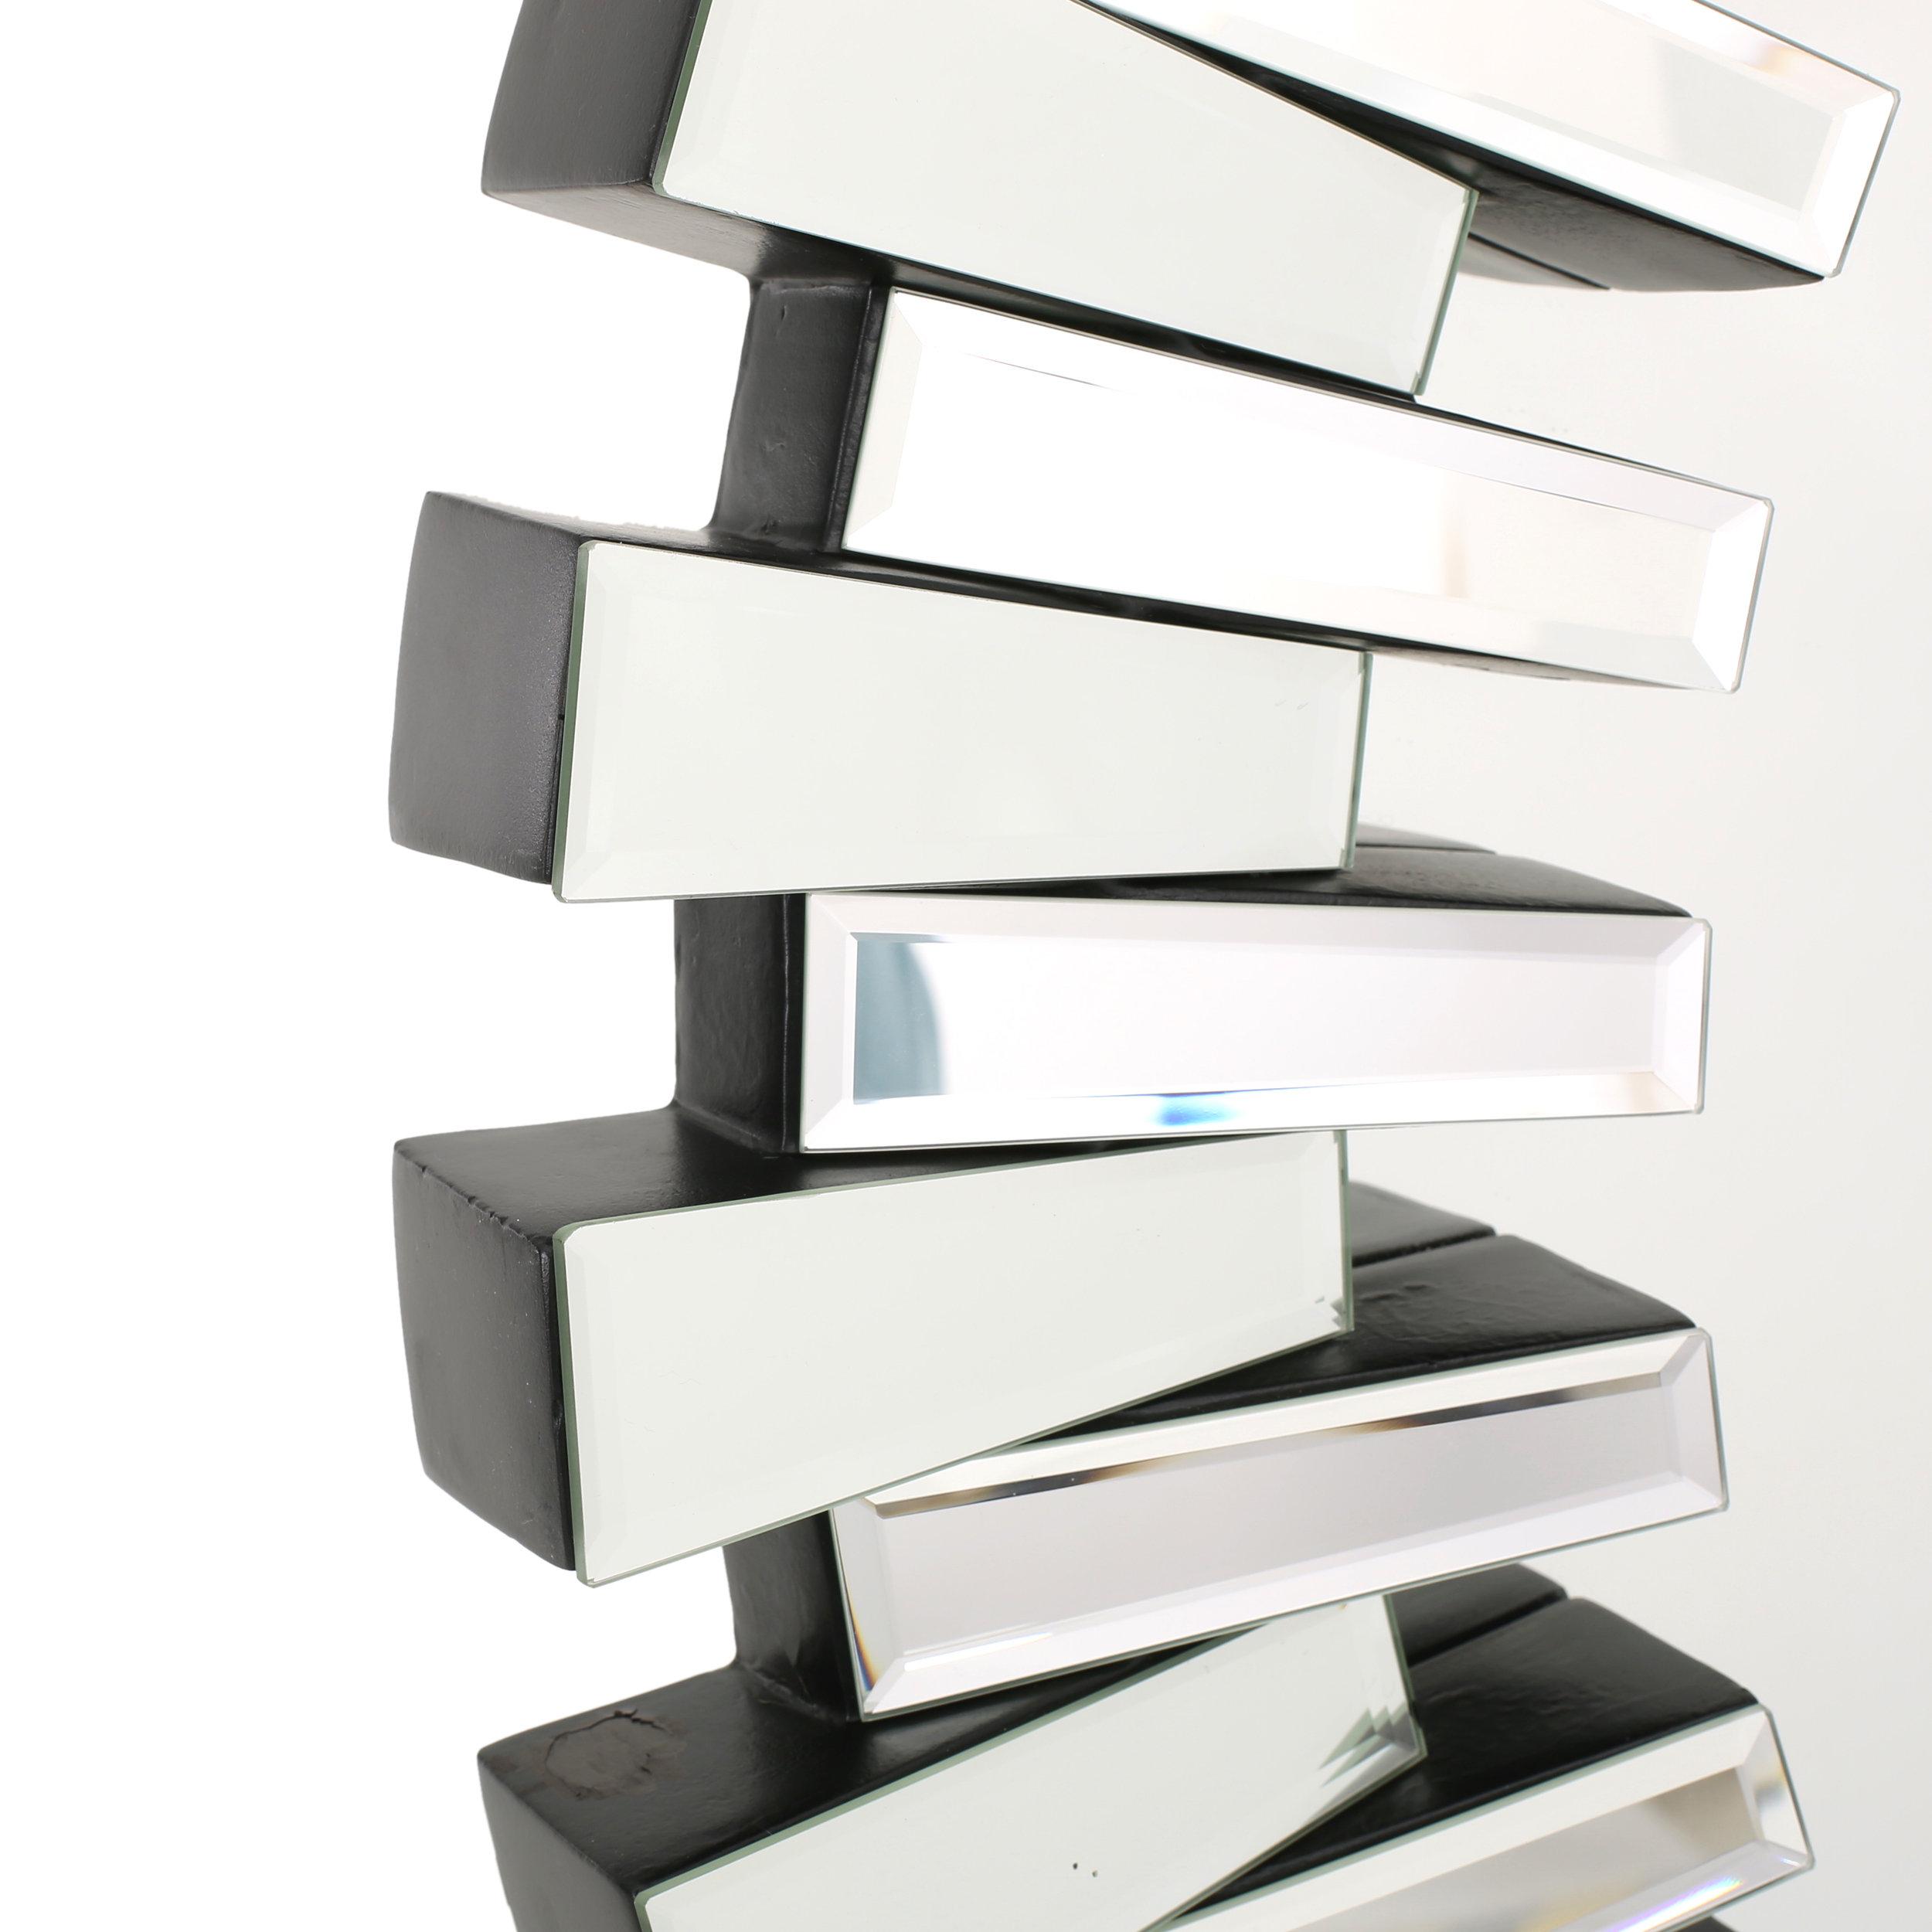 Willa Arlo Interiors Deniece Sunburst Round Wall Mirror Pertaining To Deniece Sunburst Round Wall Mirrors (Image 18 of 20)